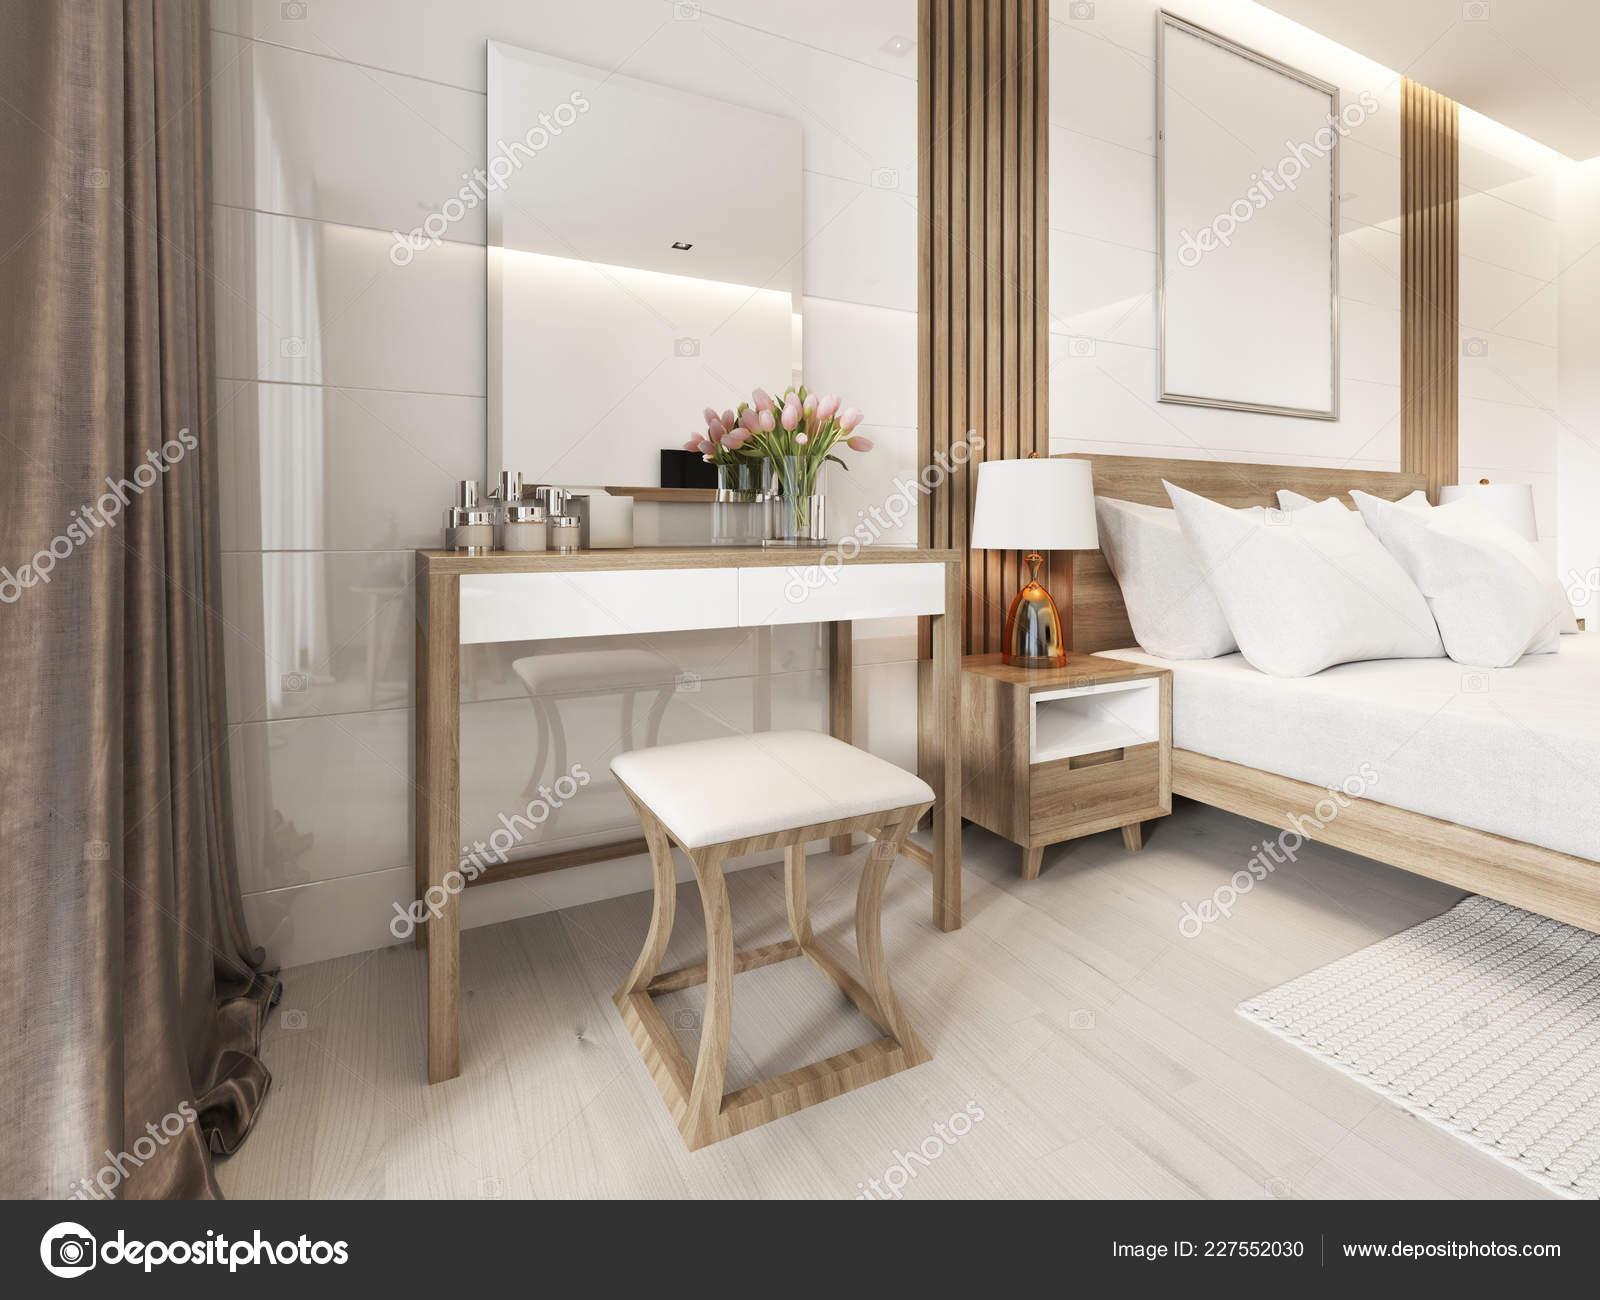 Coiffeuse Miroir Chambre Coucher Style Scandinave Rendu ...